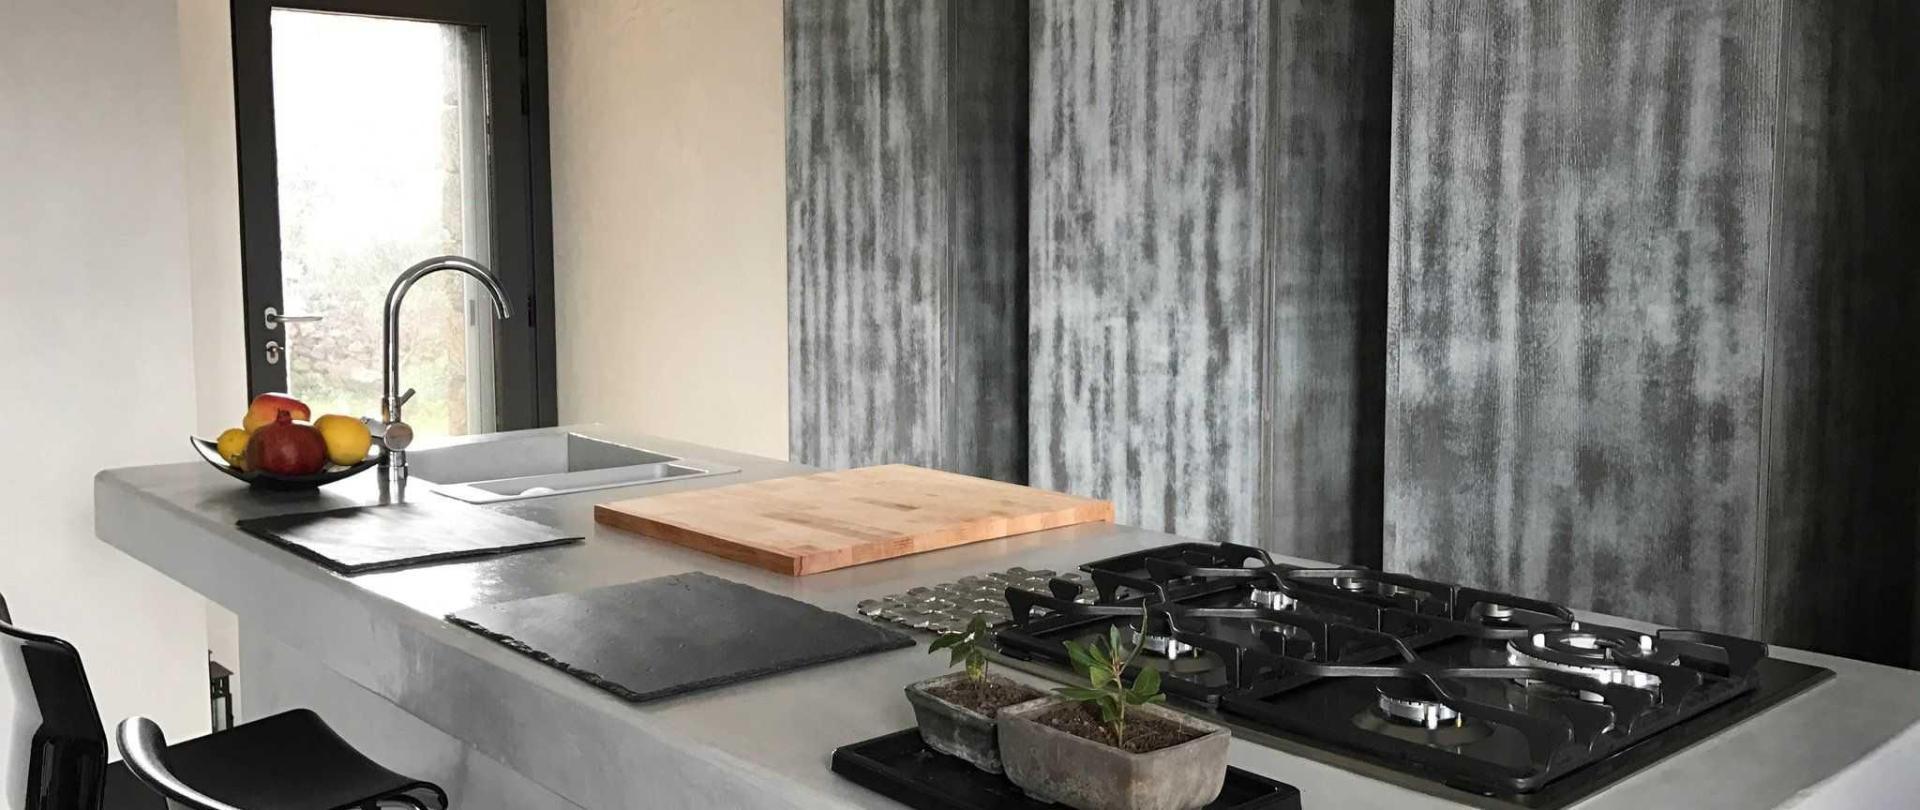 dettaglio-isola-cucina-1.JPG